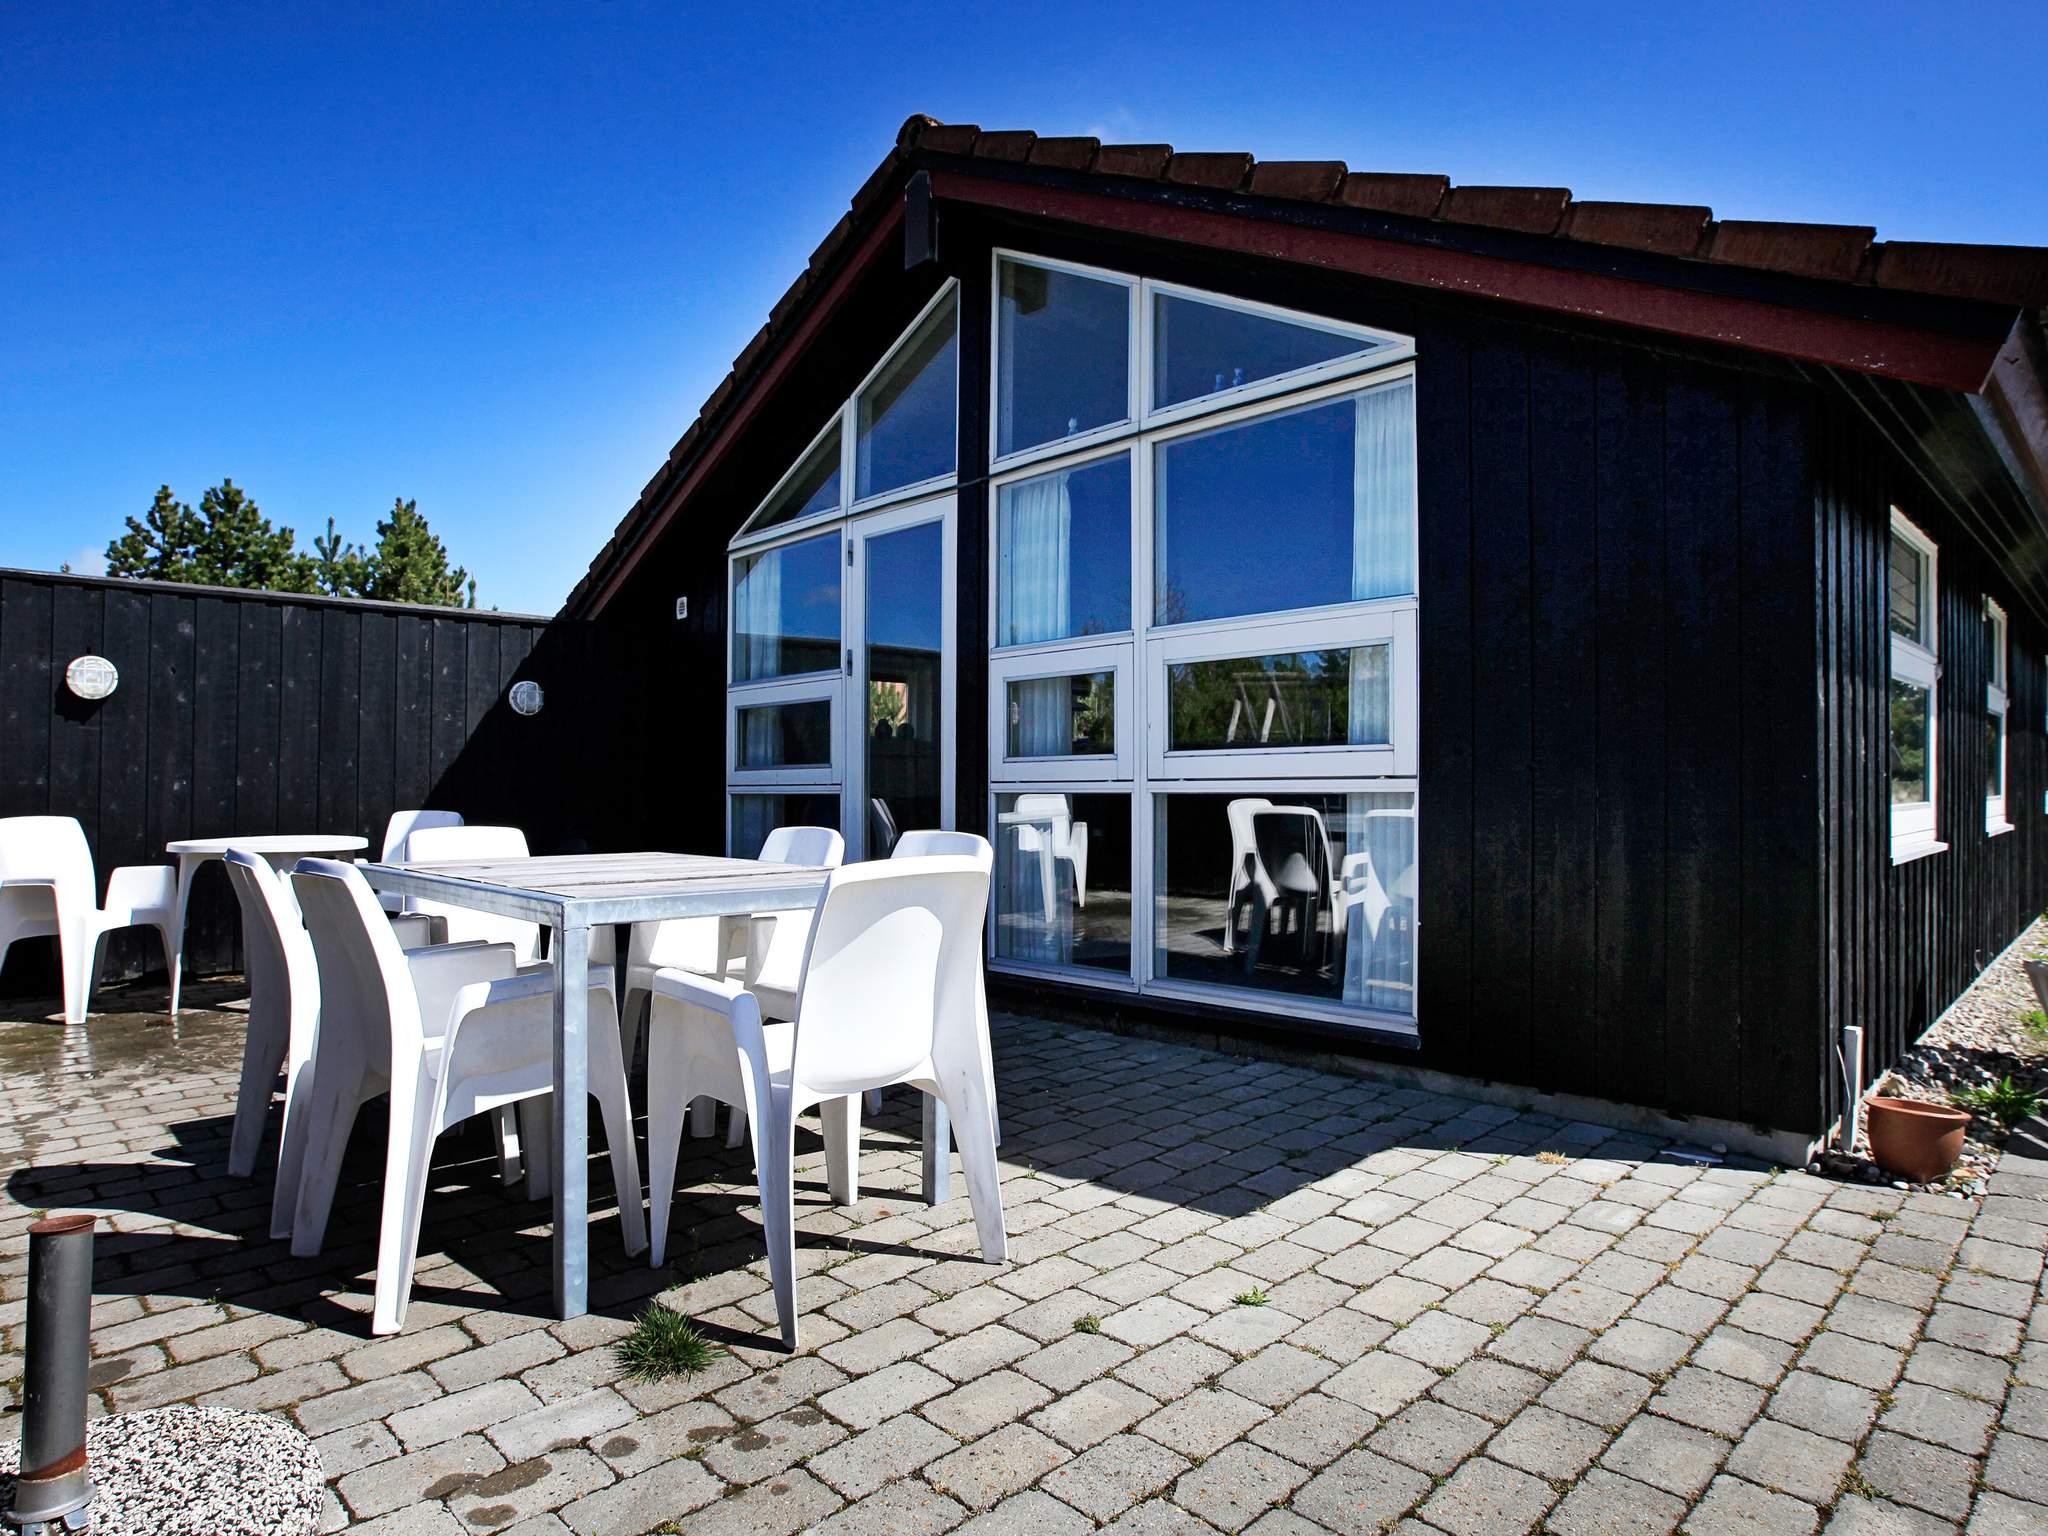 Ferienhaus Blåvand (88586), Blåvand, , Westjütland, Dänemark, Bild 15